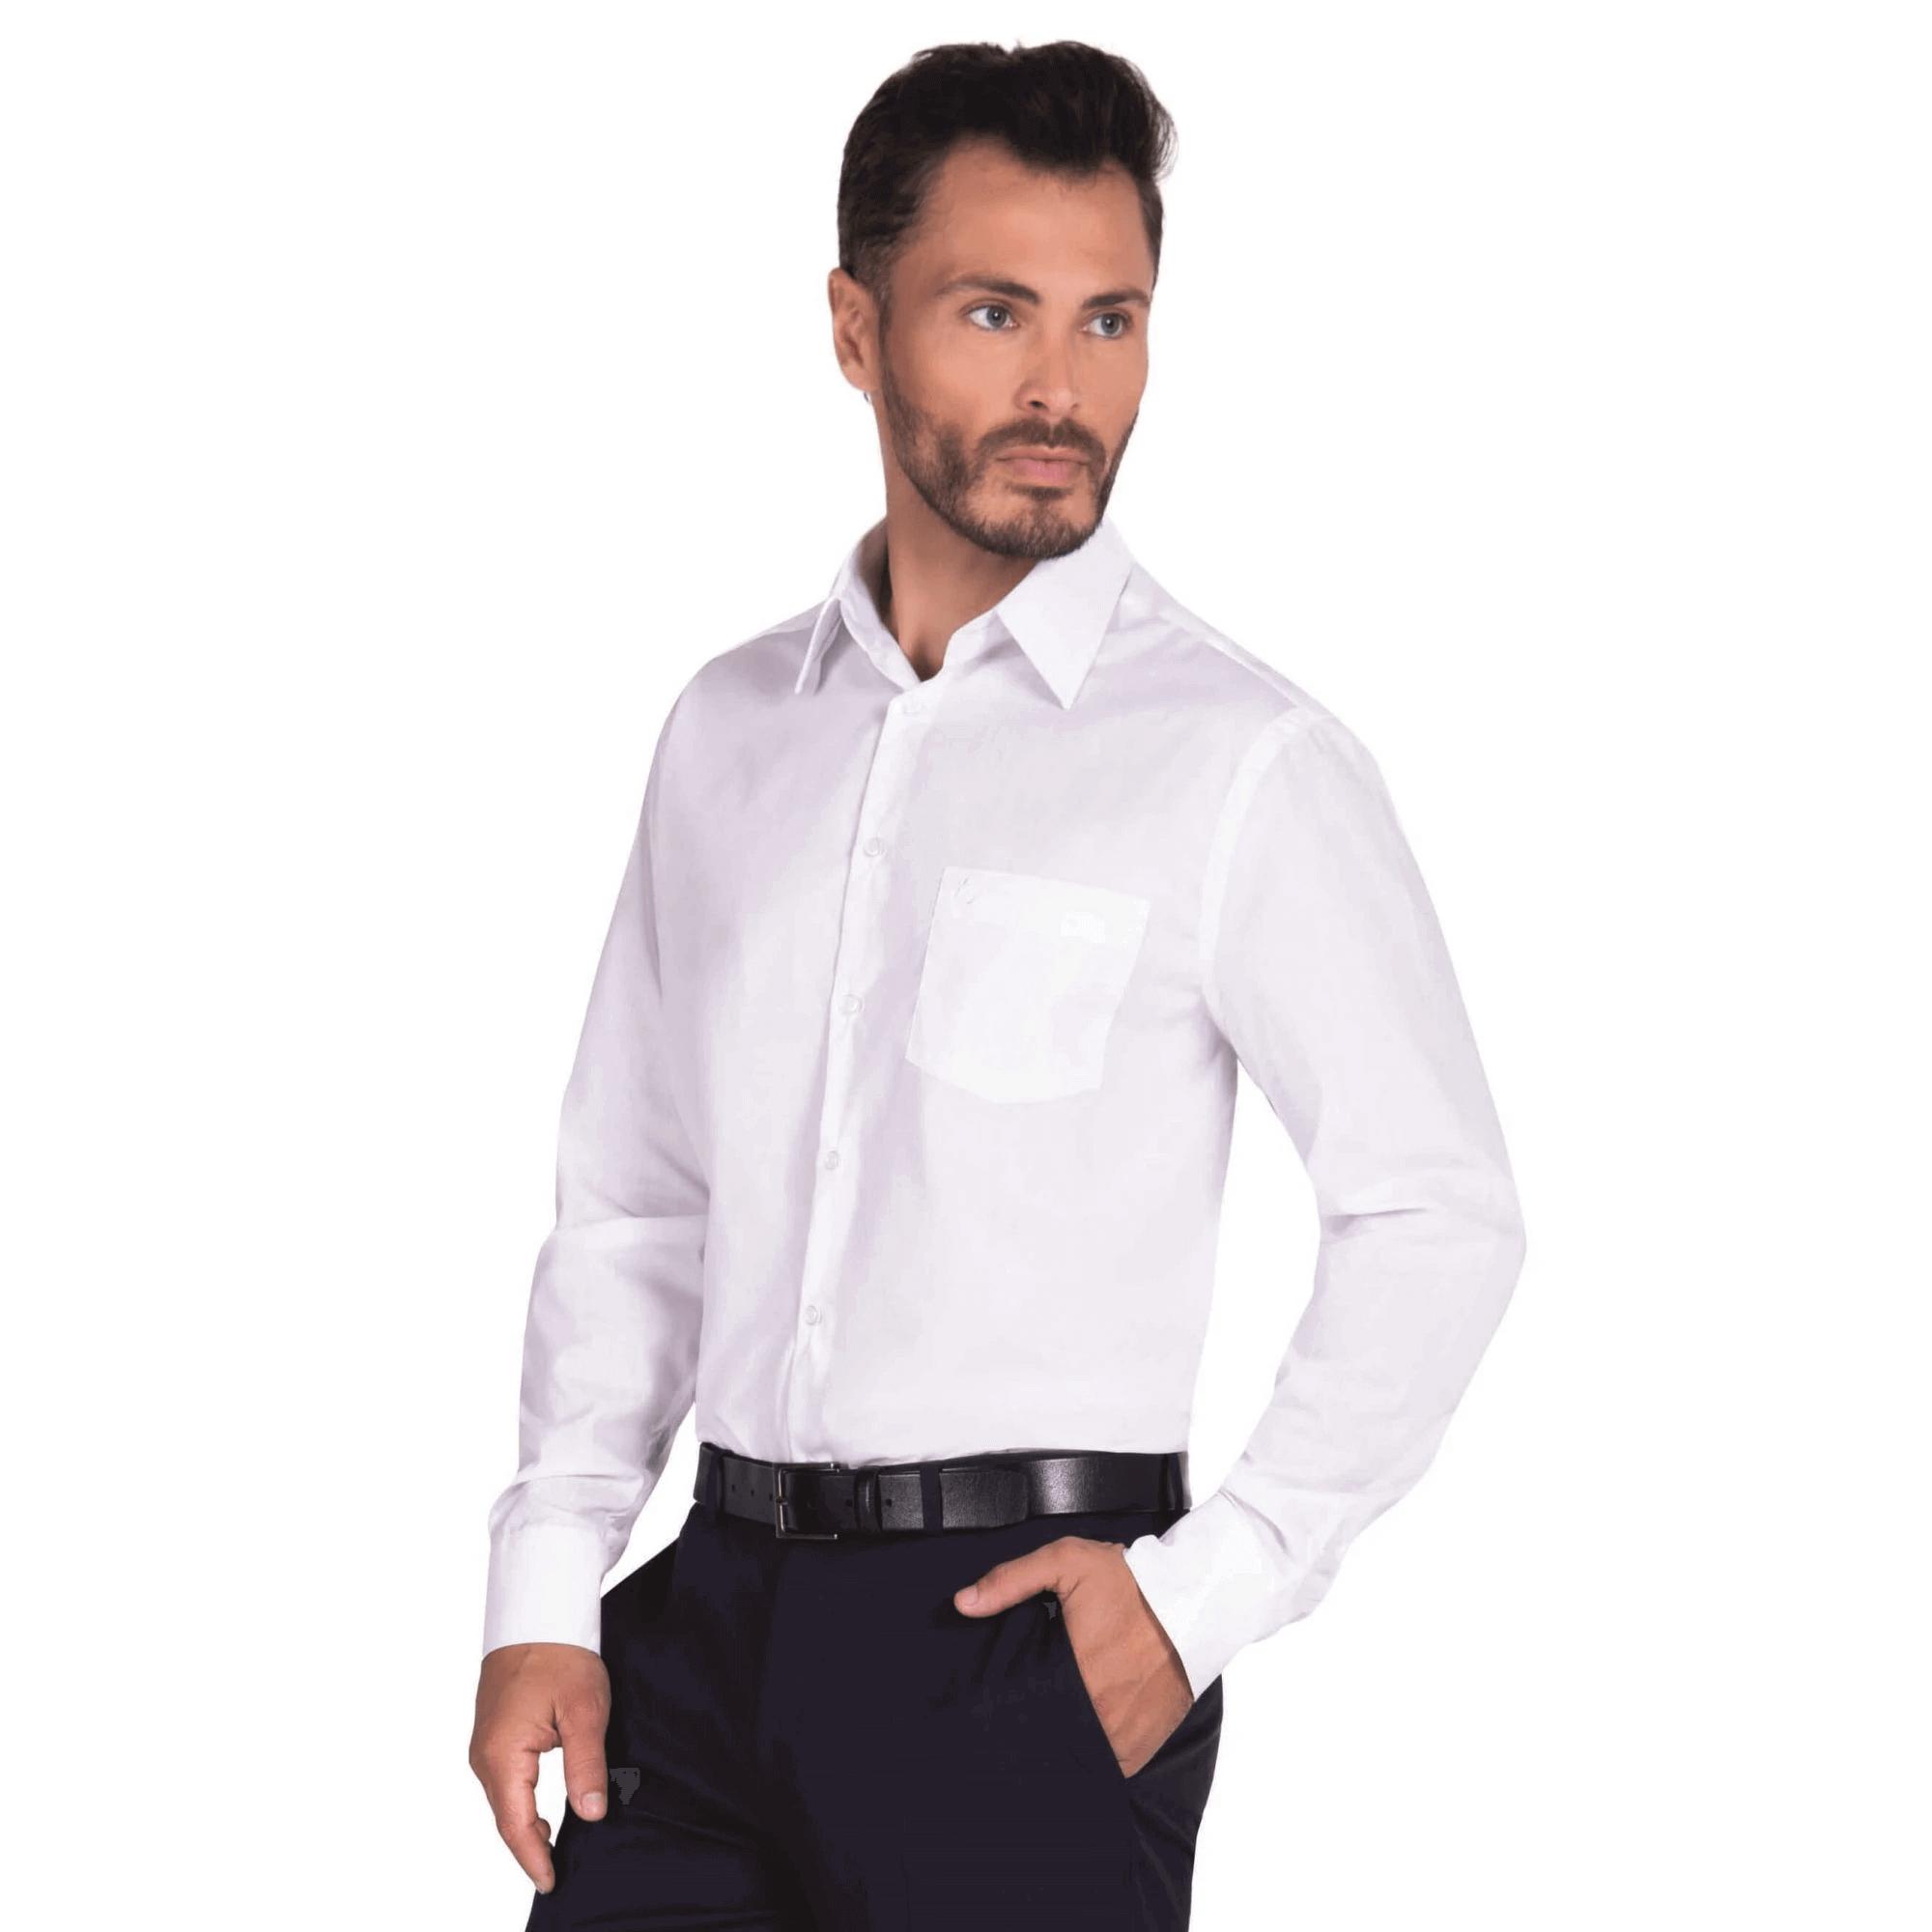 Camisa Social Masculina Olimpo Plus Size Lisa com Bolso Manga Longa